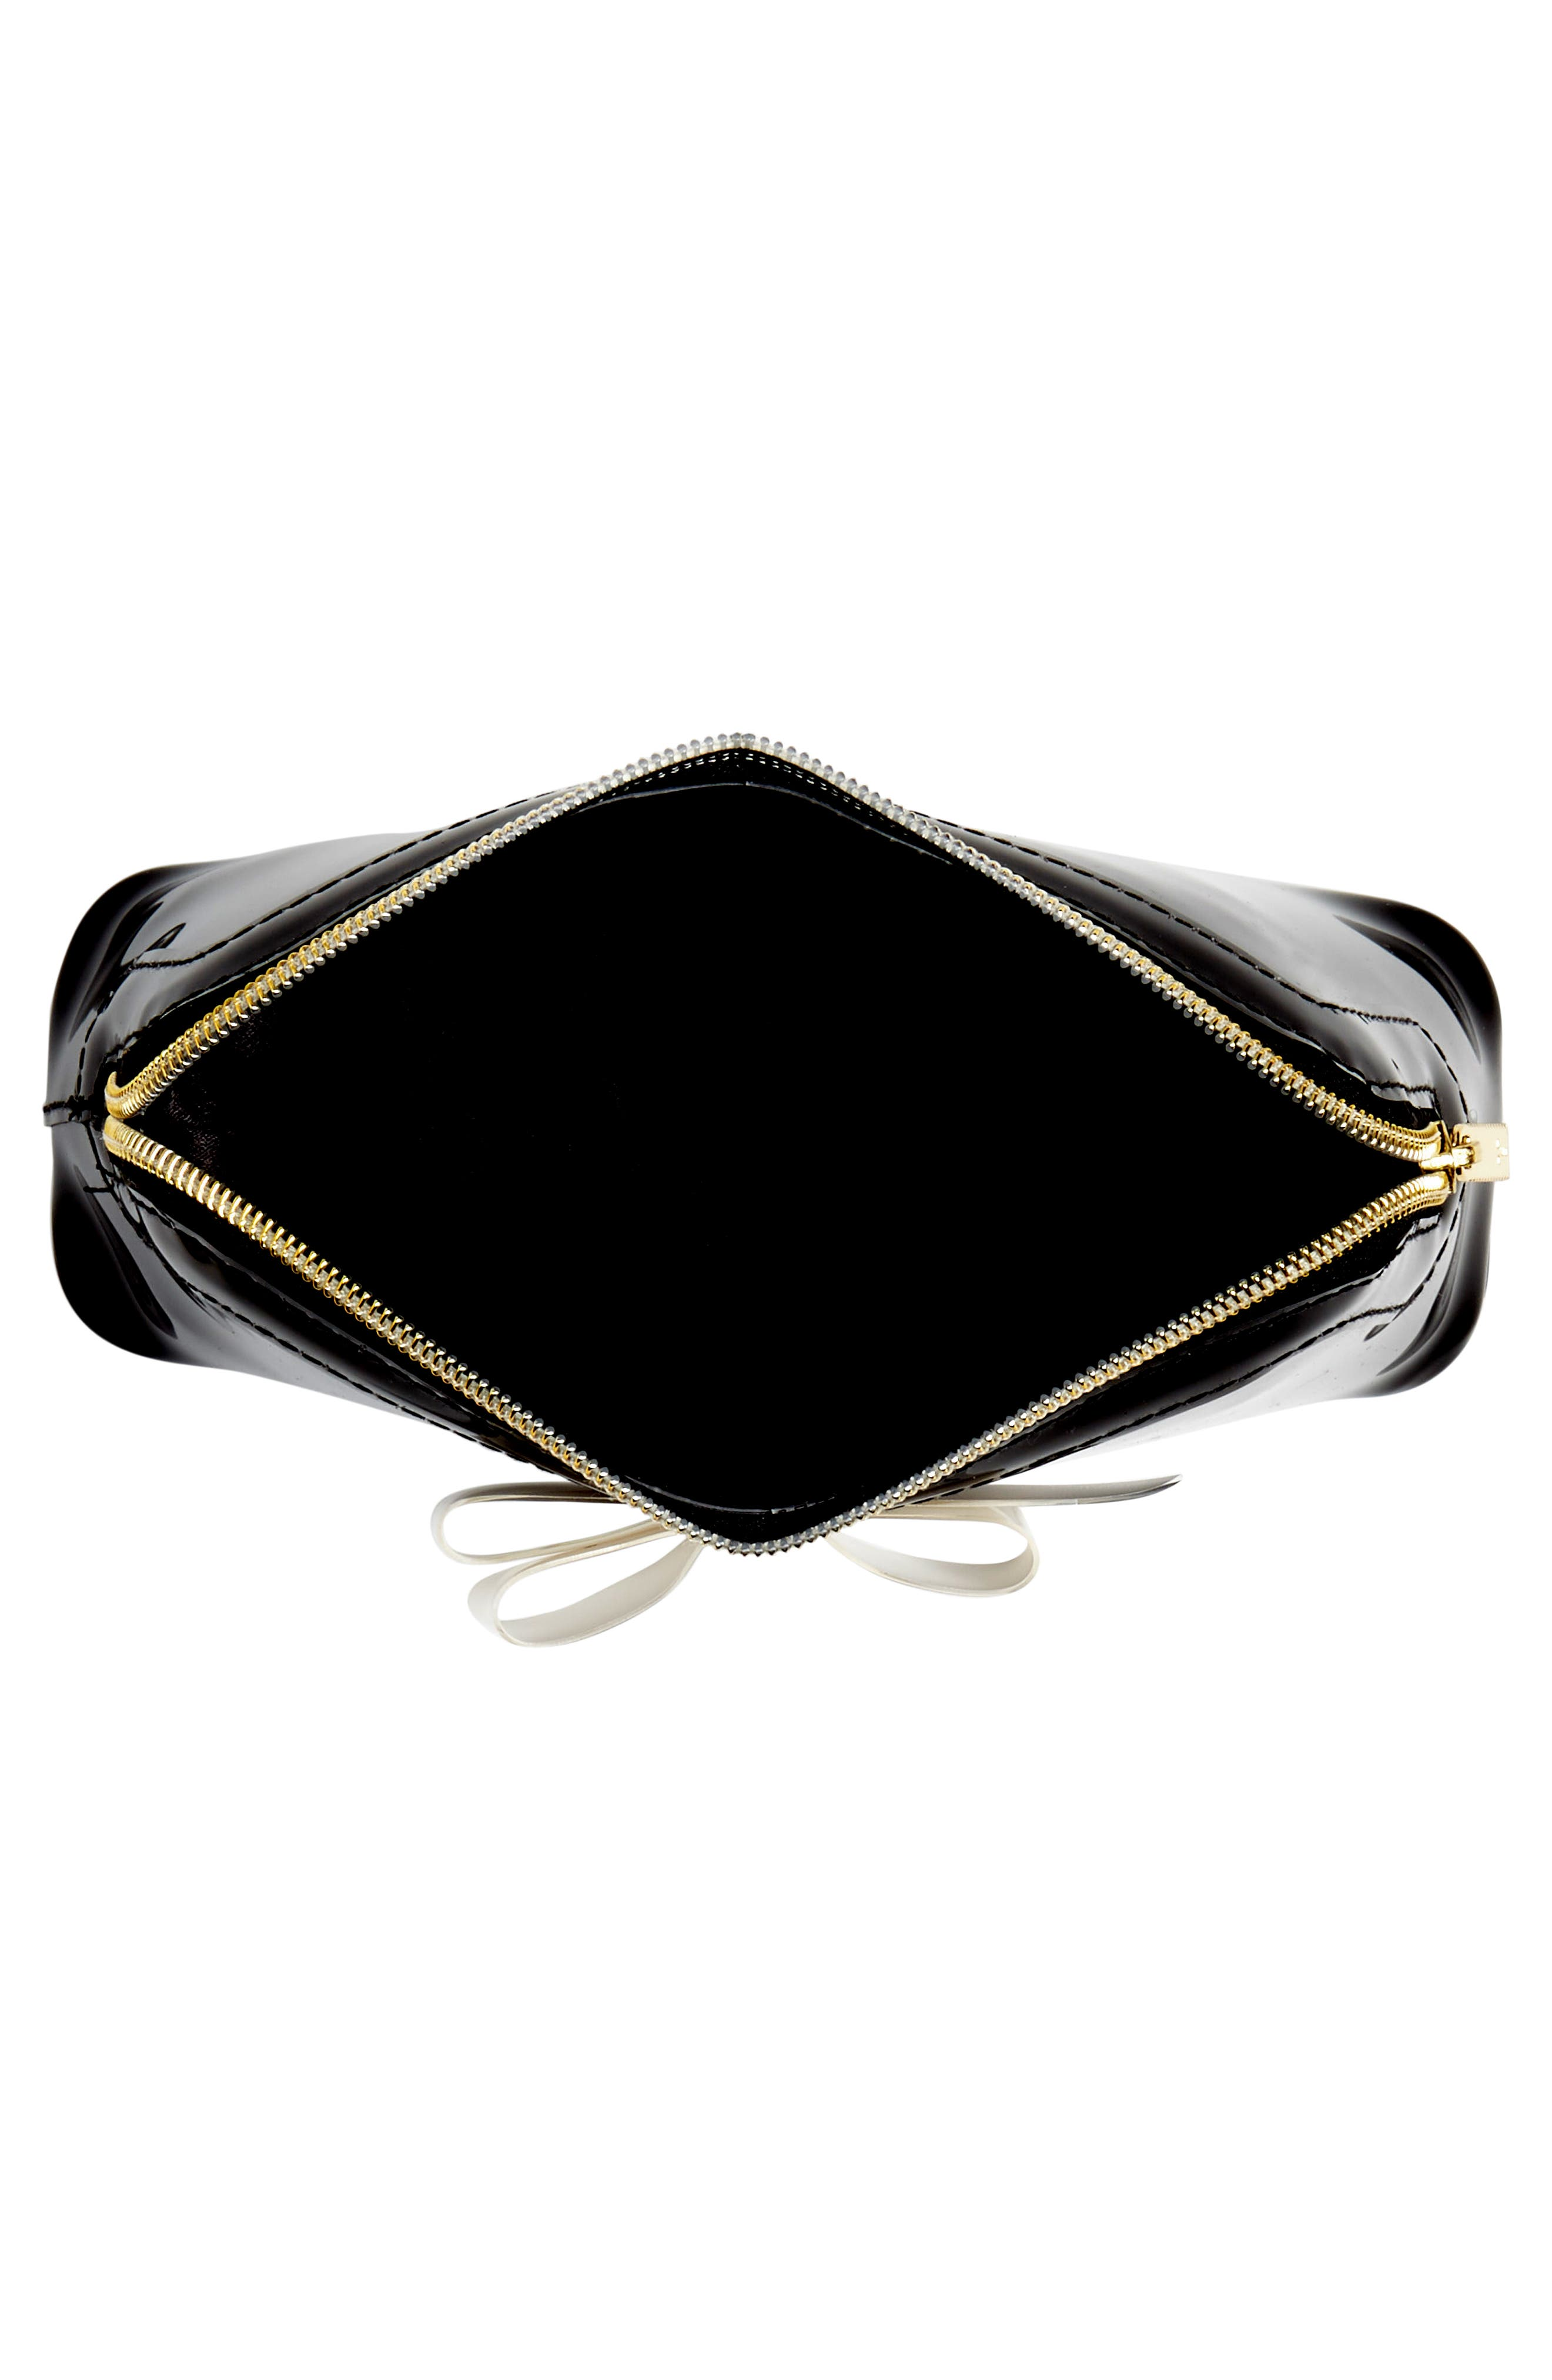 TED BAKER LONDON, Cahira Bow Cosmetics Case, Alternate thumbnail 3, color, BLACK